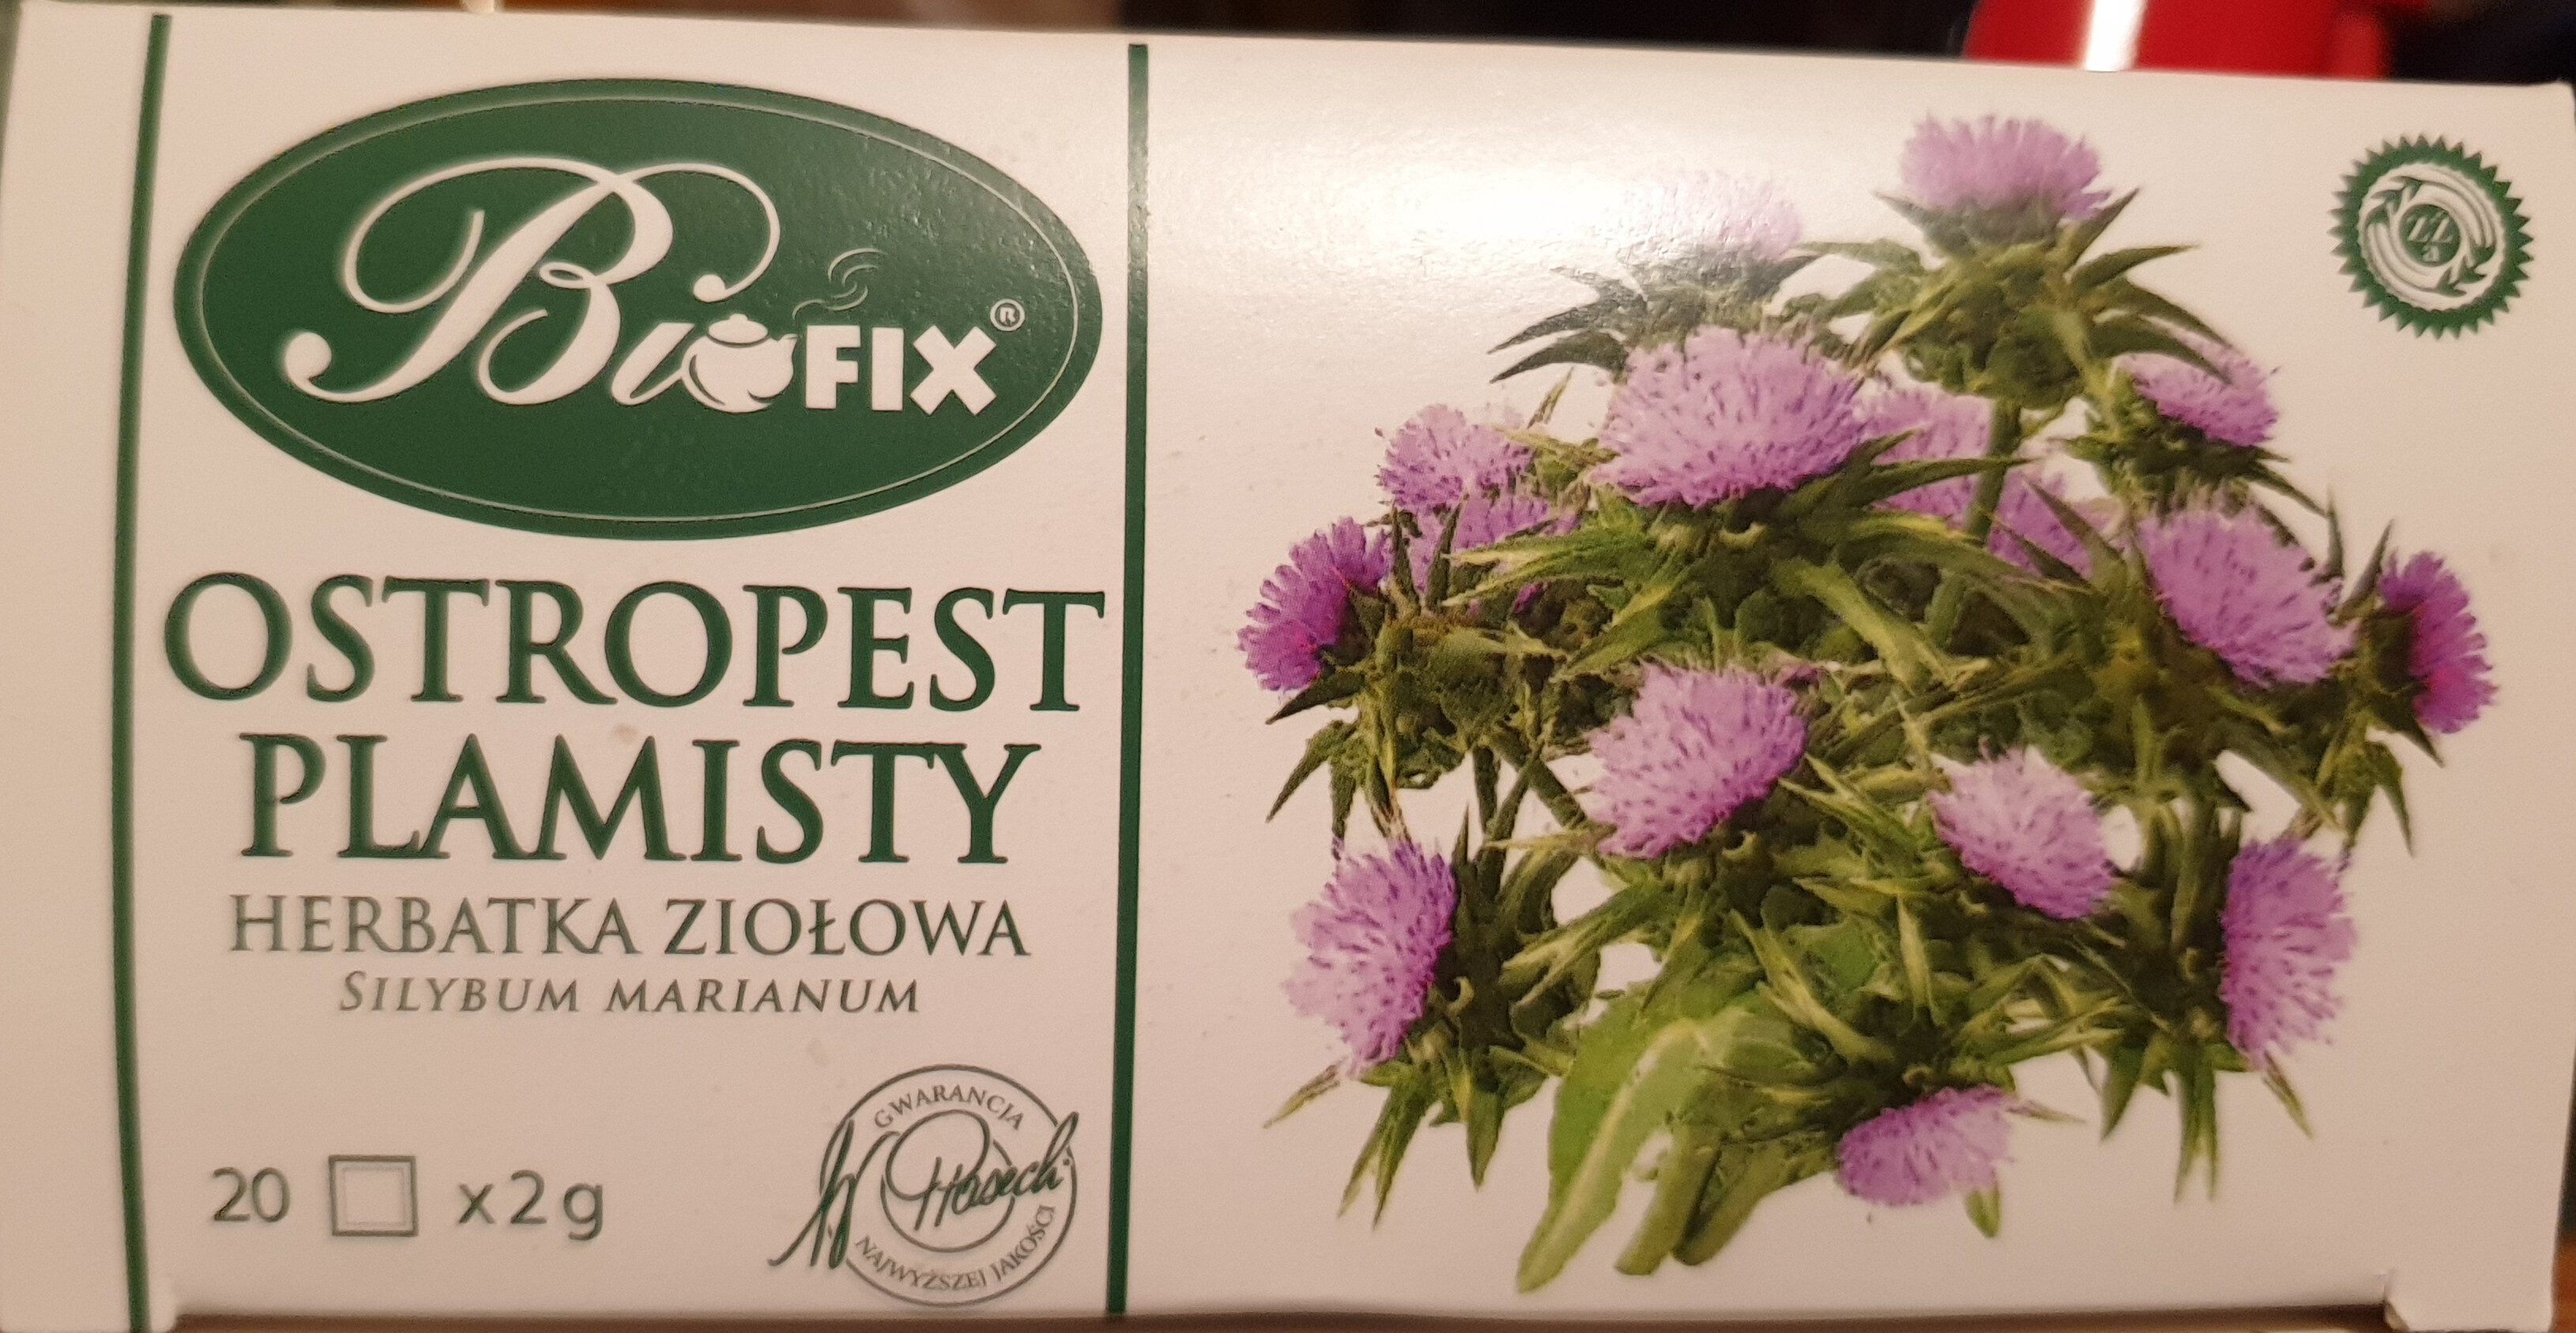 Ostropest plamisty - Product - pl